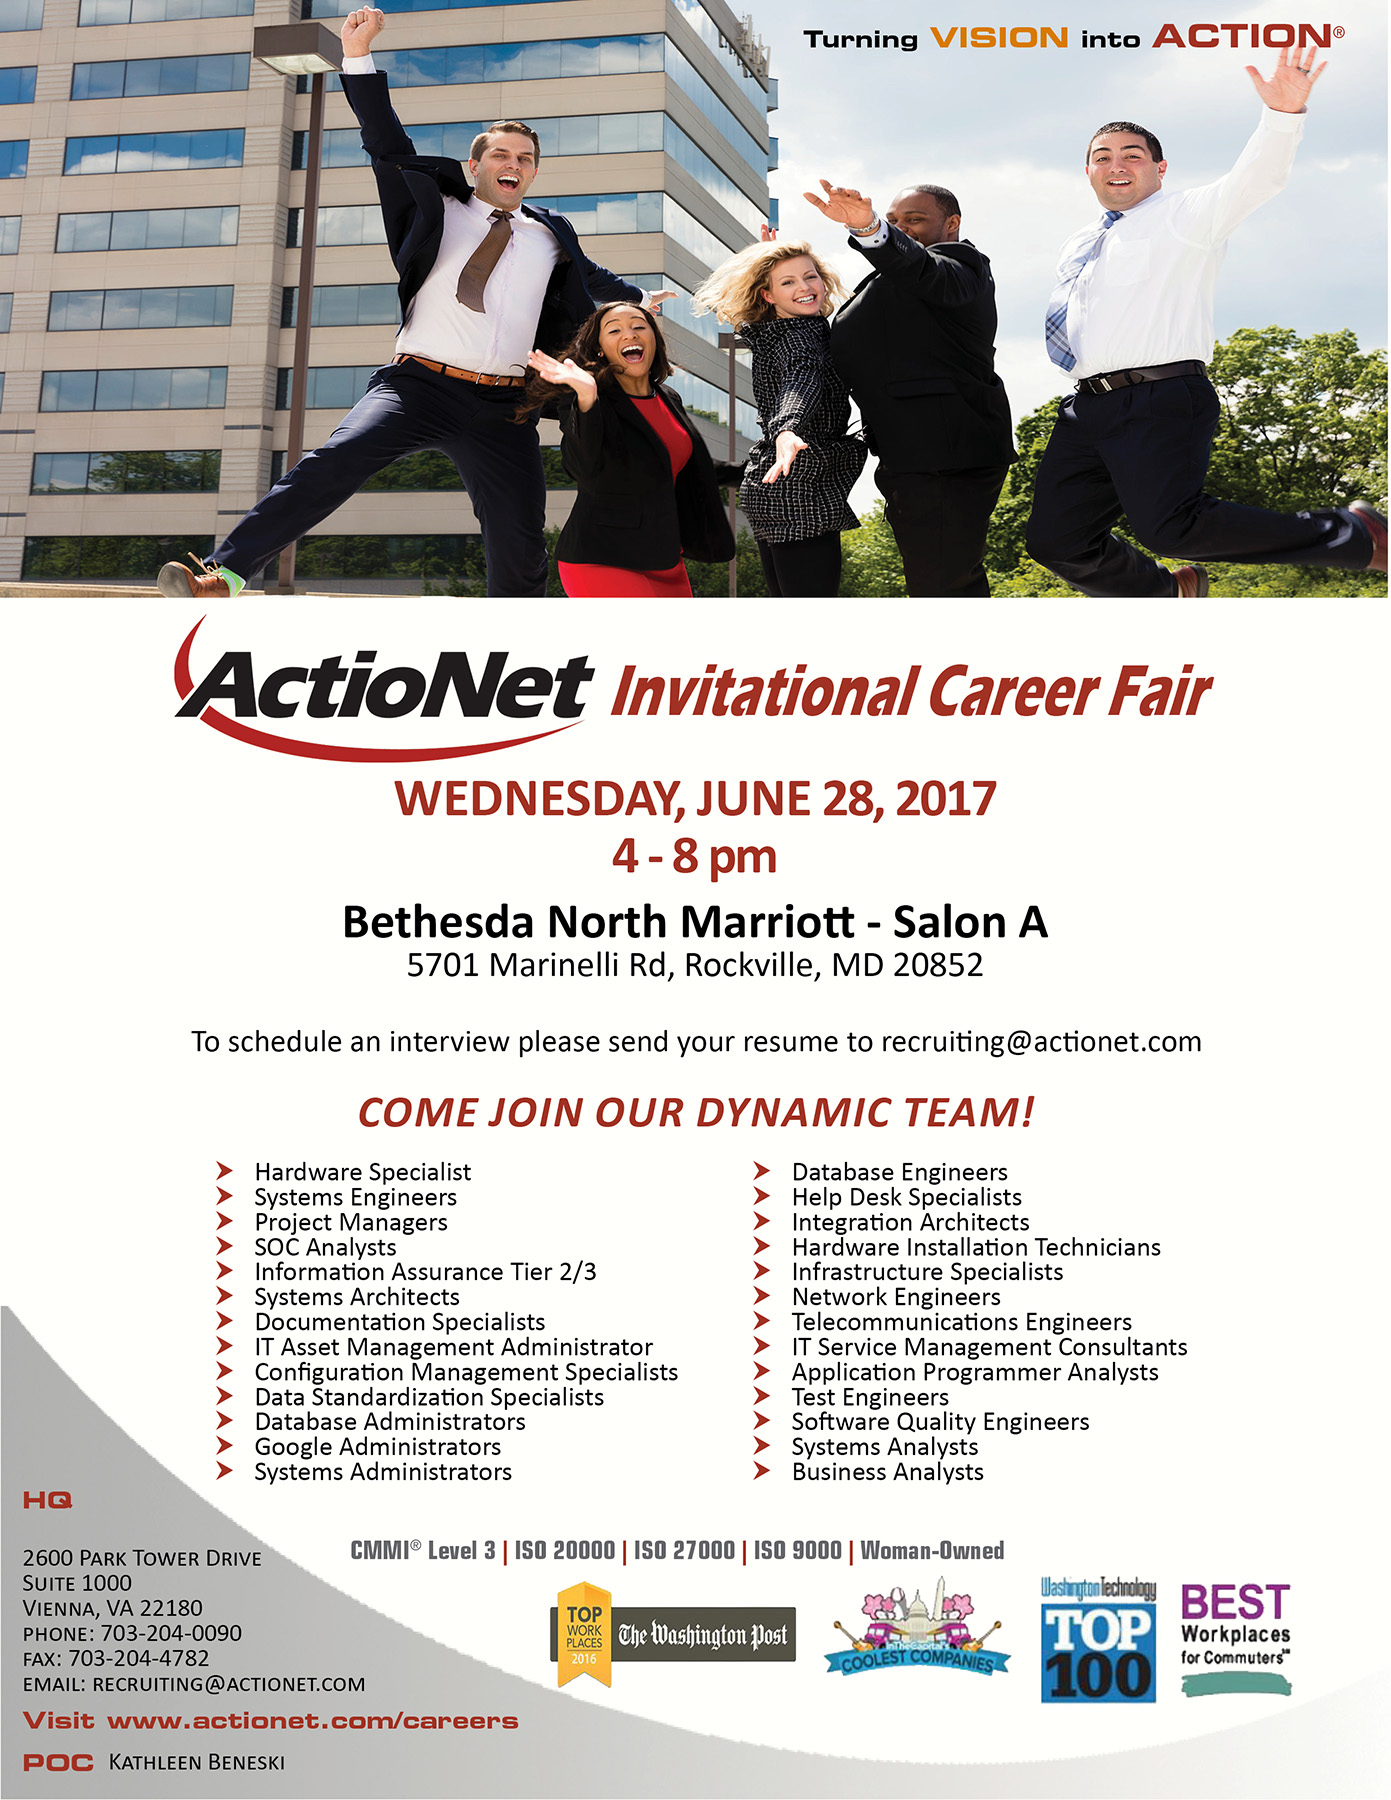 Invitational Career Fair